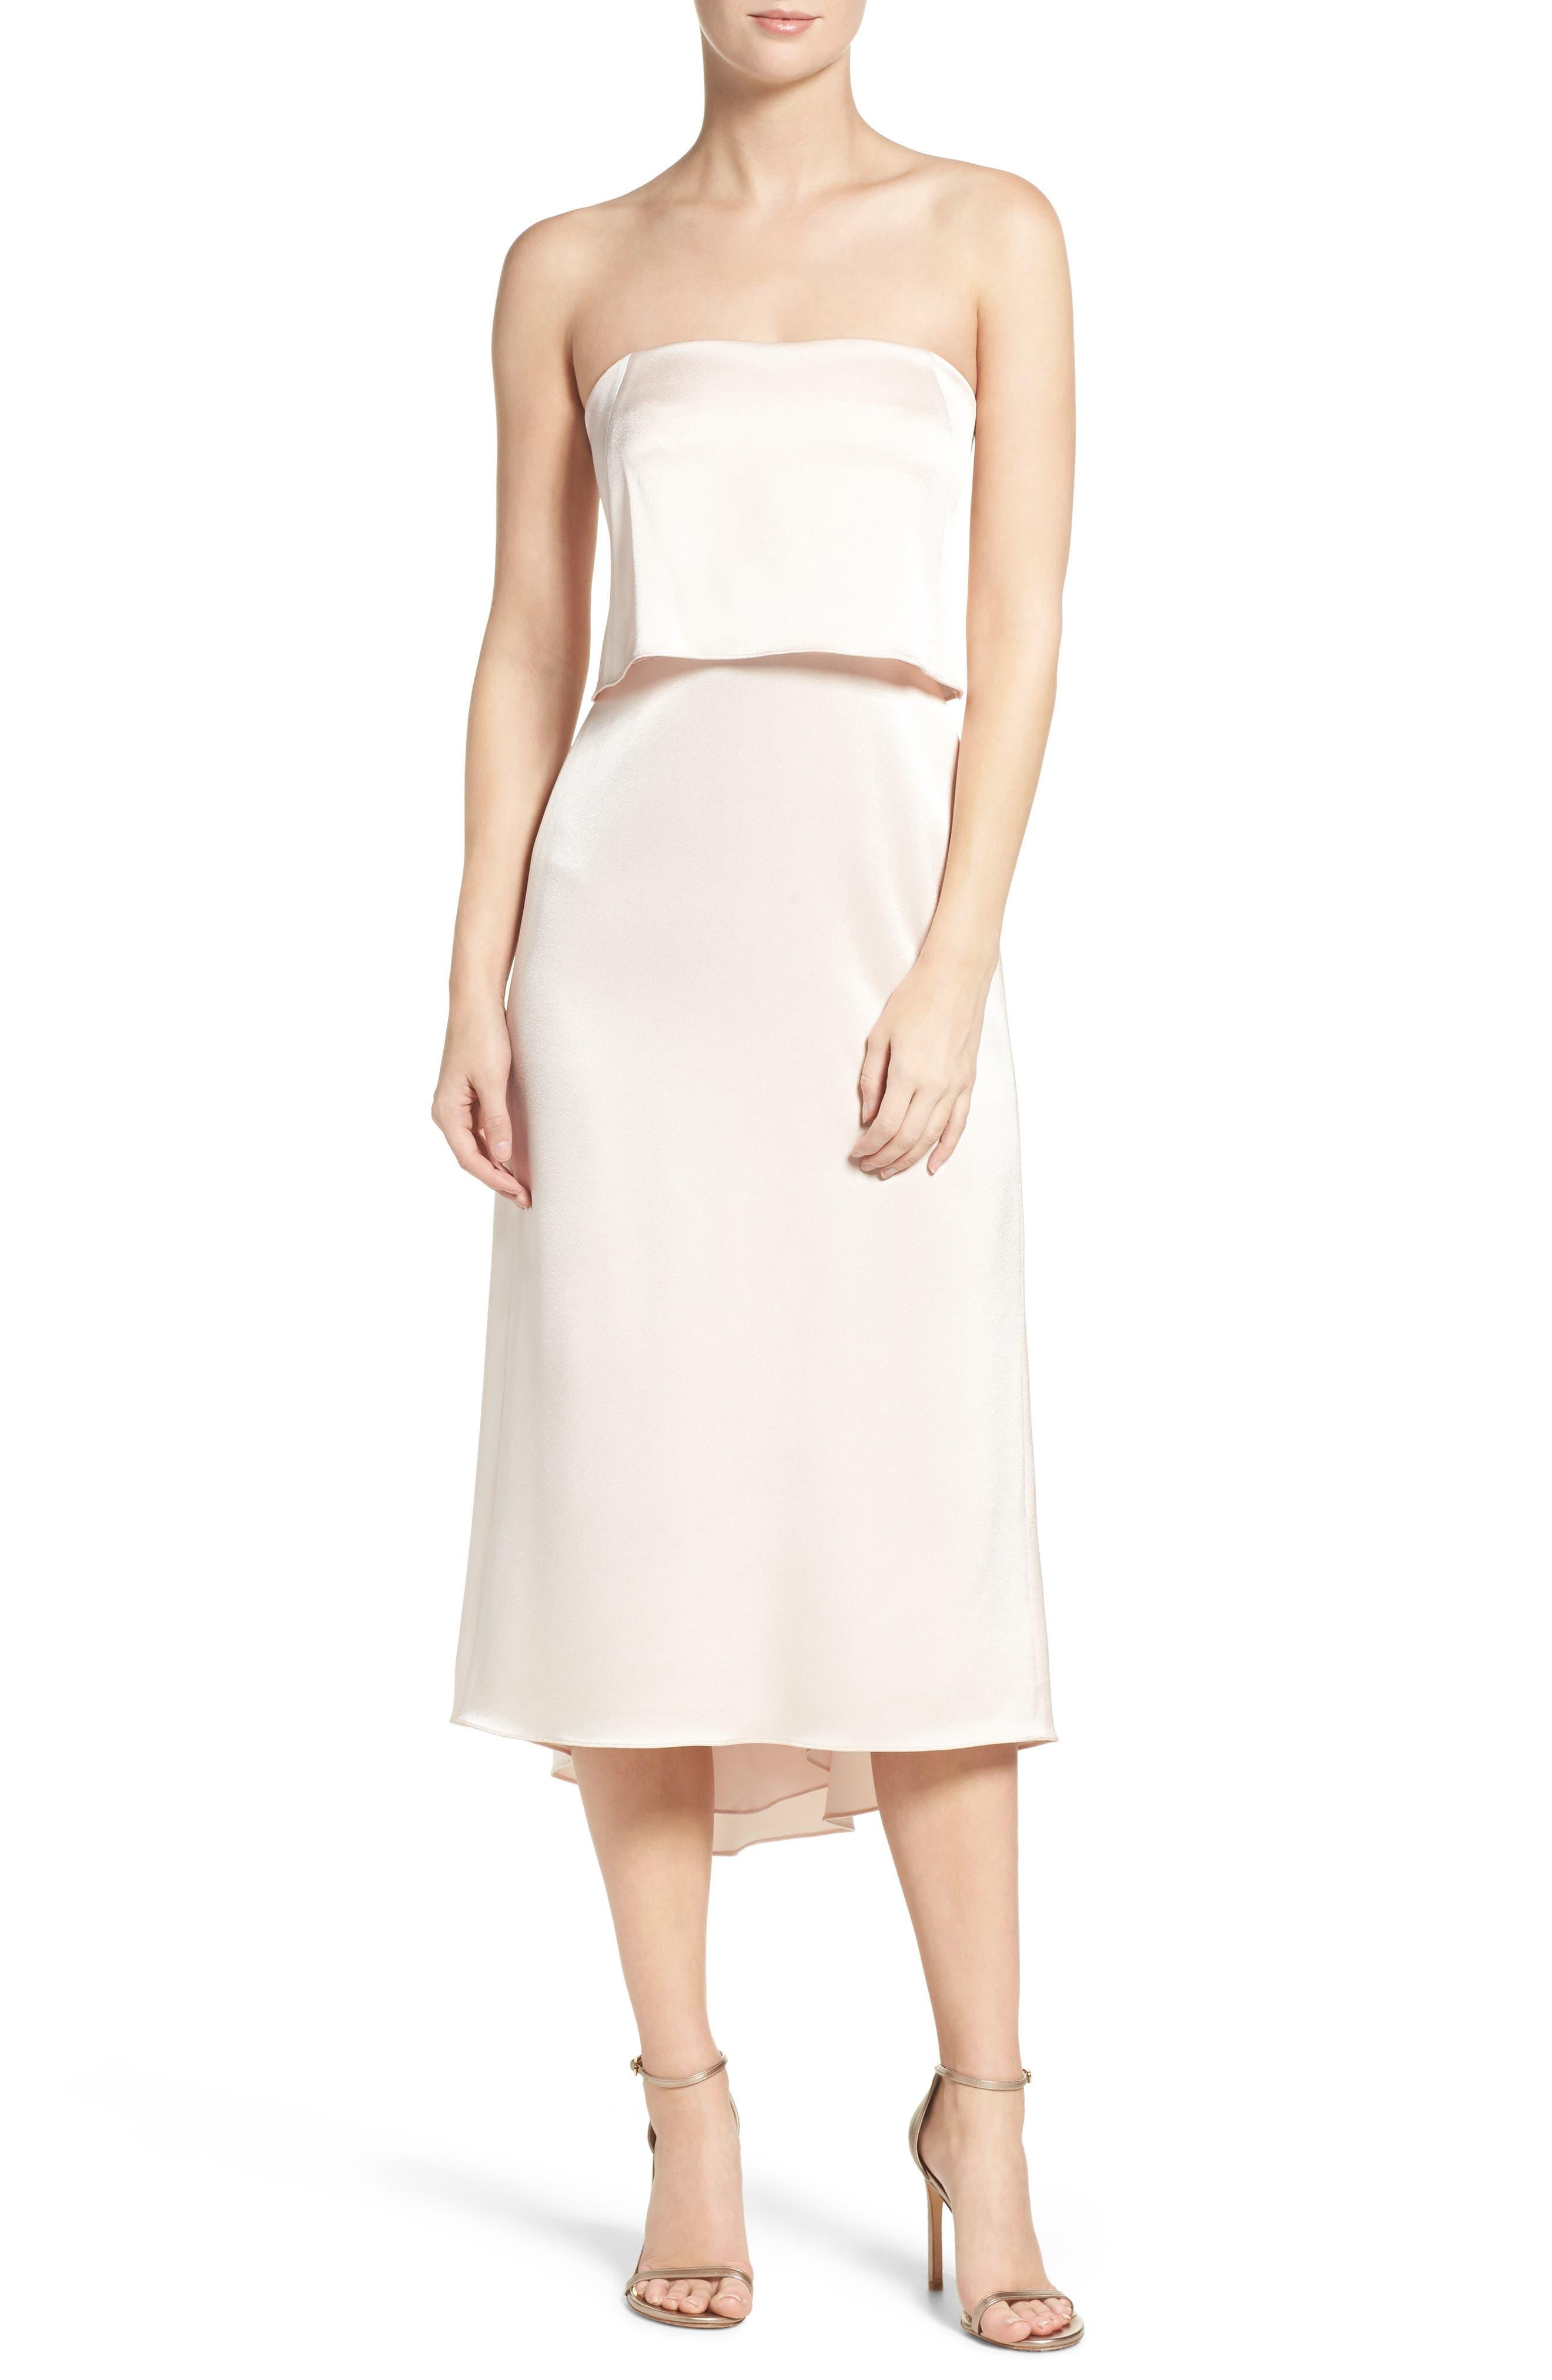 Alternate Image 1 Selected - Halston Heritage Strapless Dress